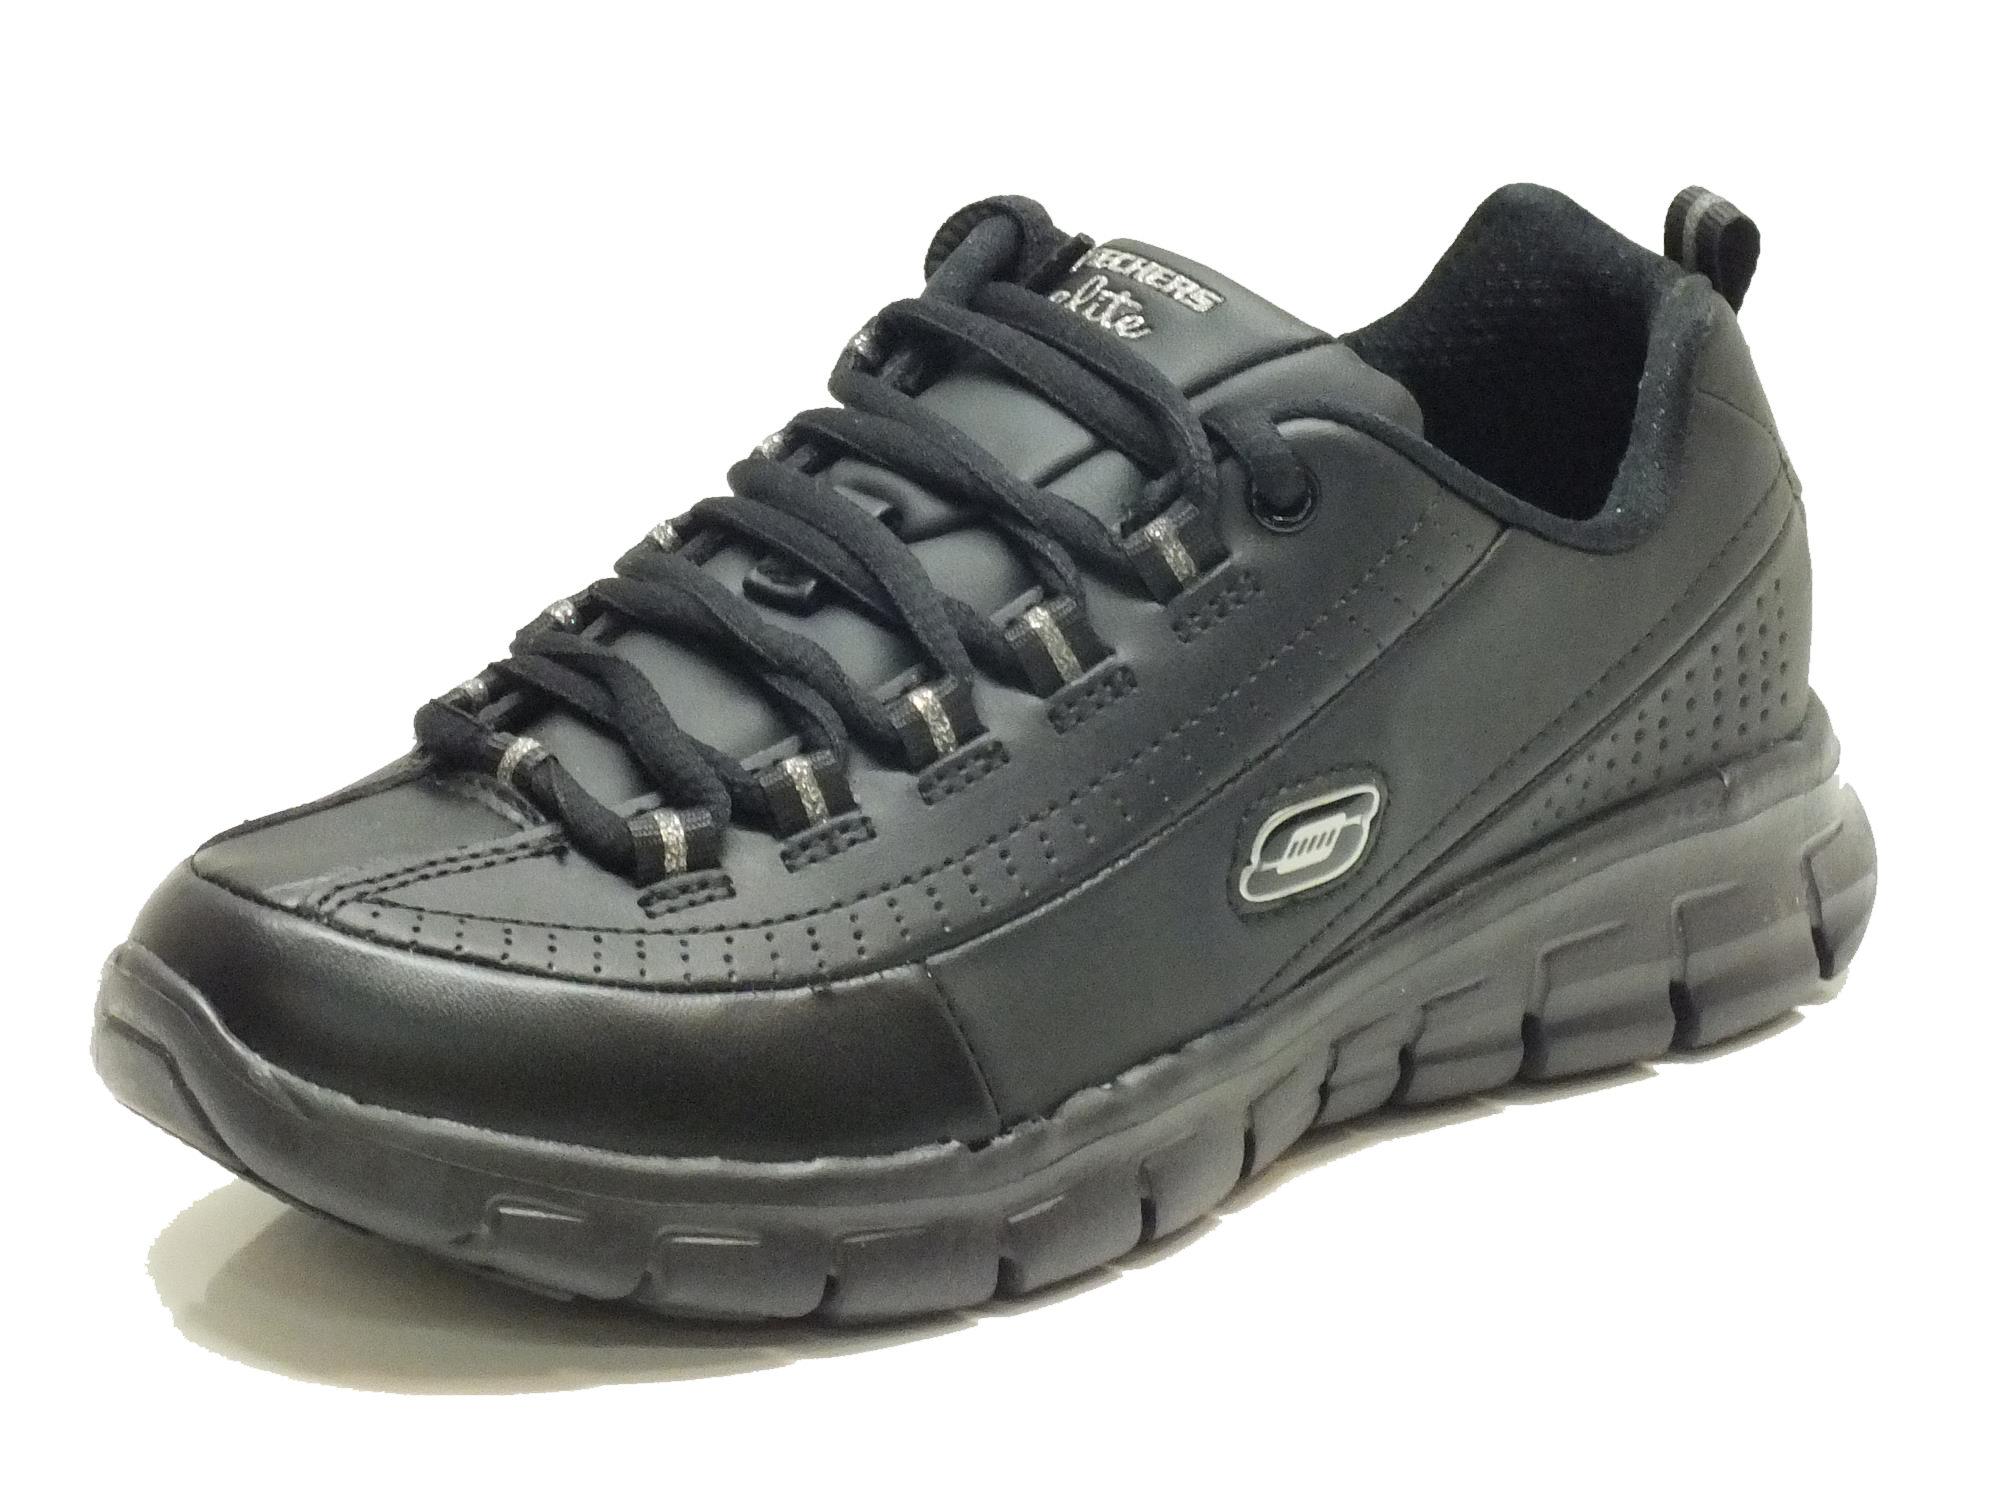 Scarpe Skechers Sport per donna in pelle nera